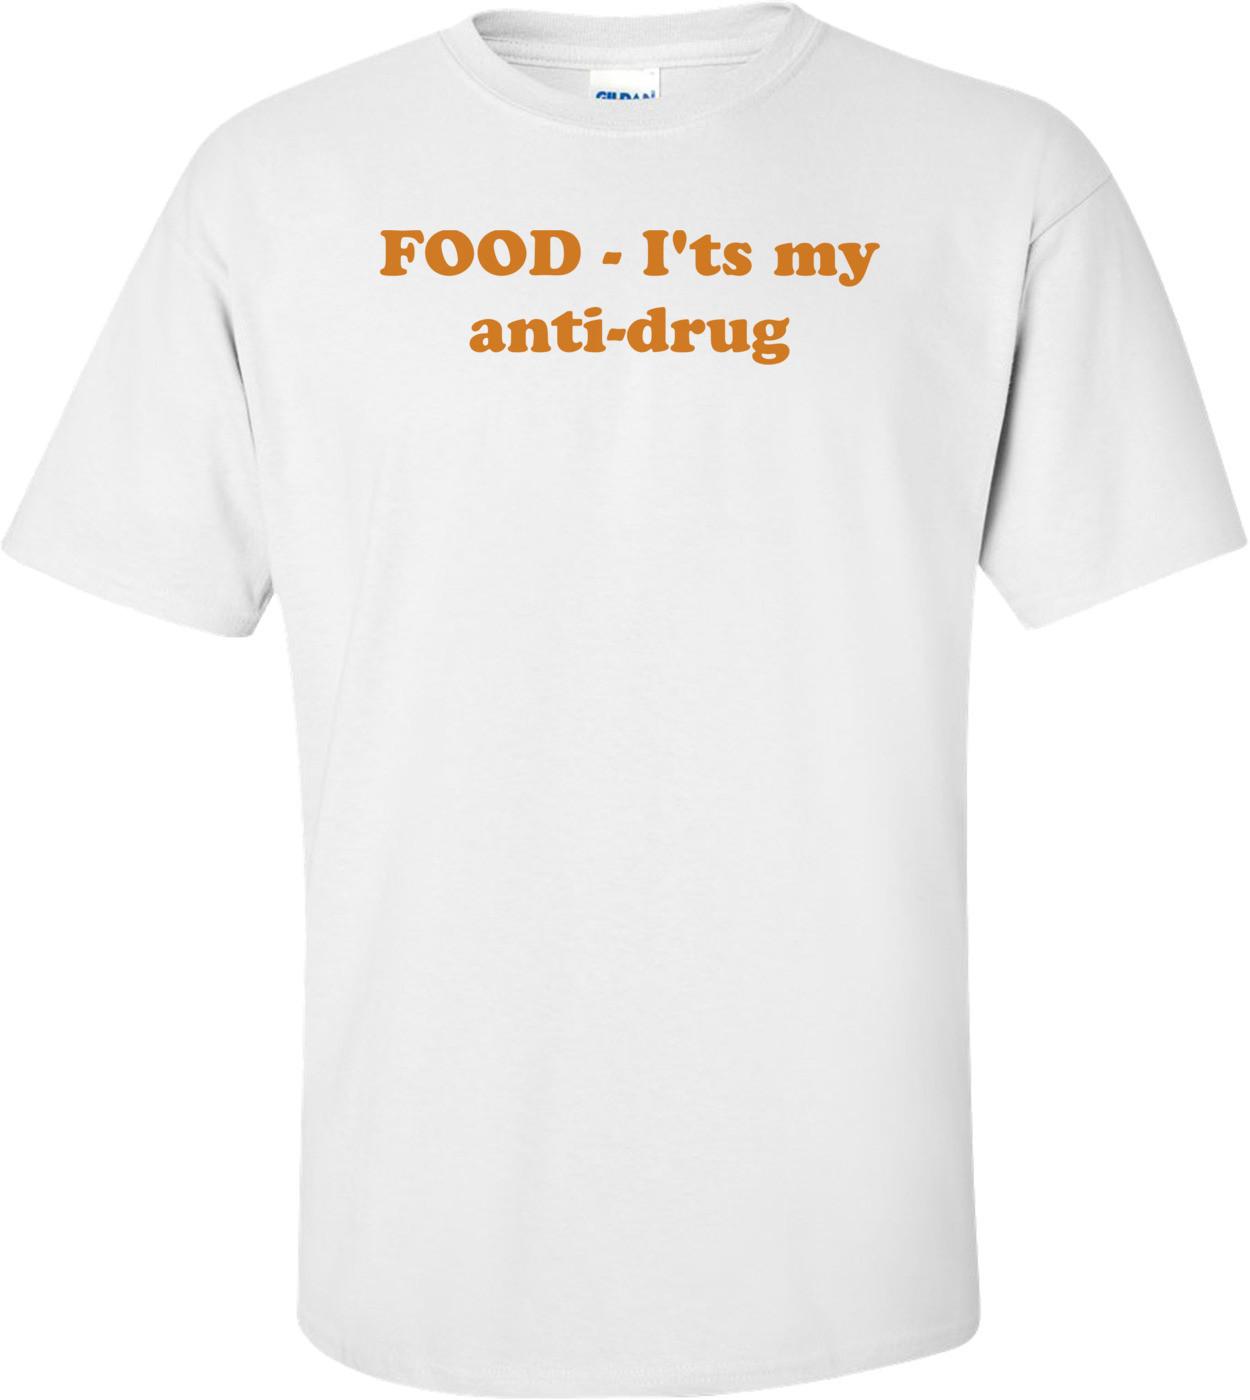 FOOD - I'ts my anti-drug Shirt